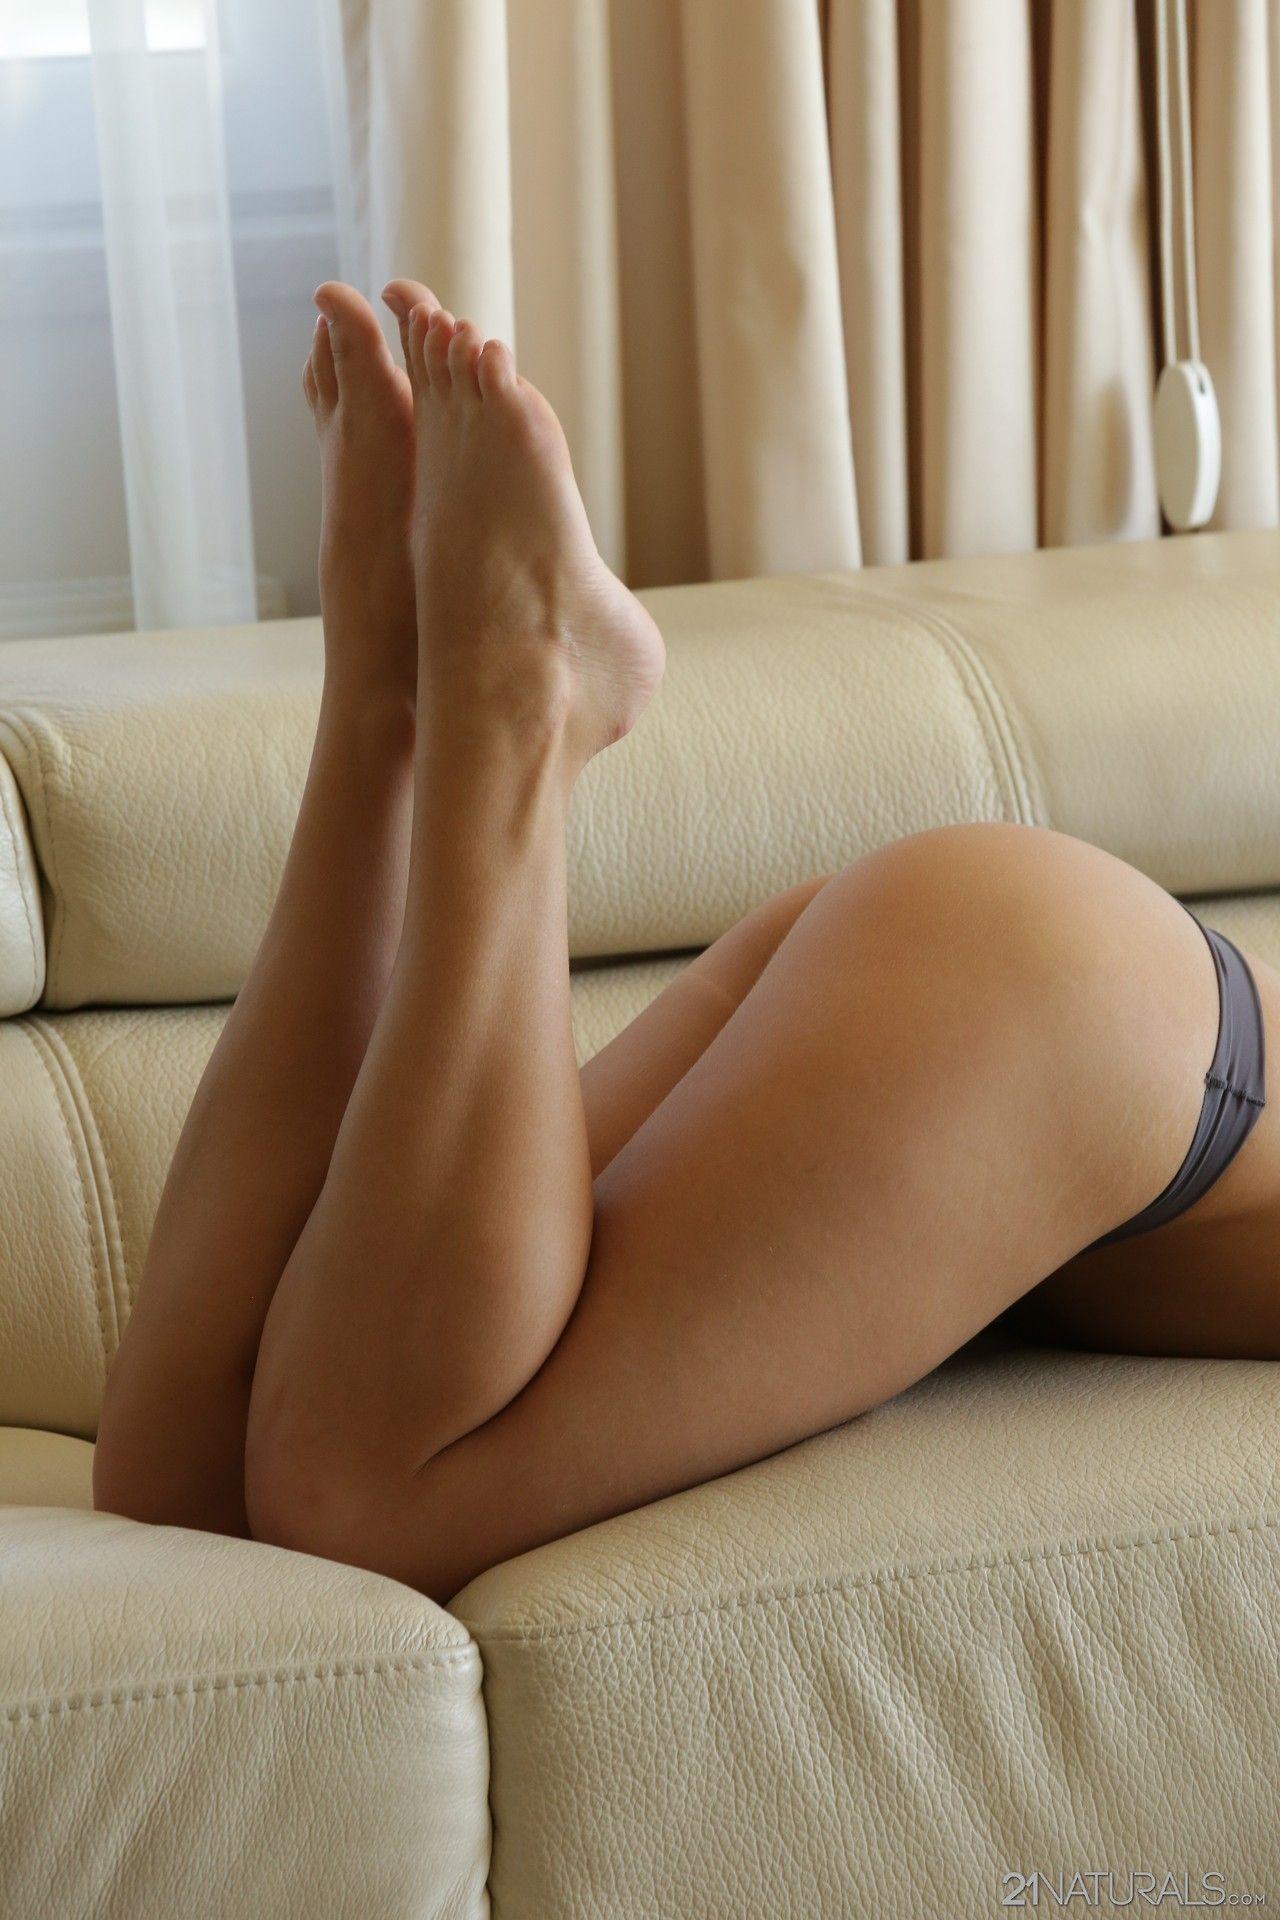 Sexy hot girls gifs boobs bounce dance buns perfect legs bad ideas